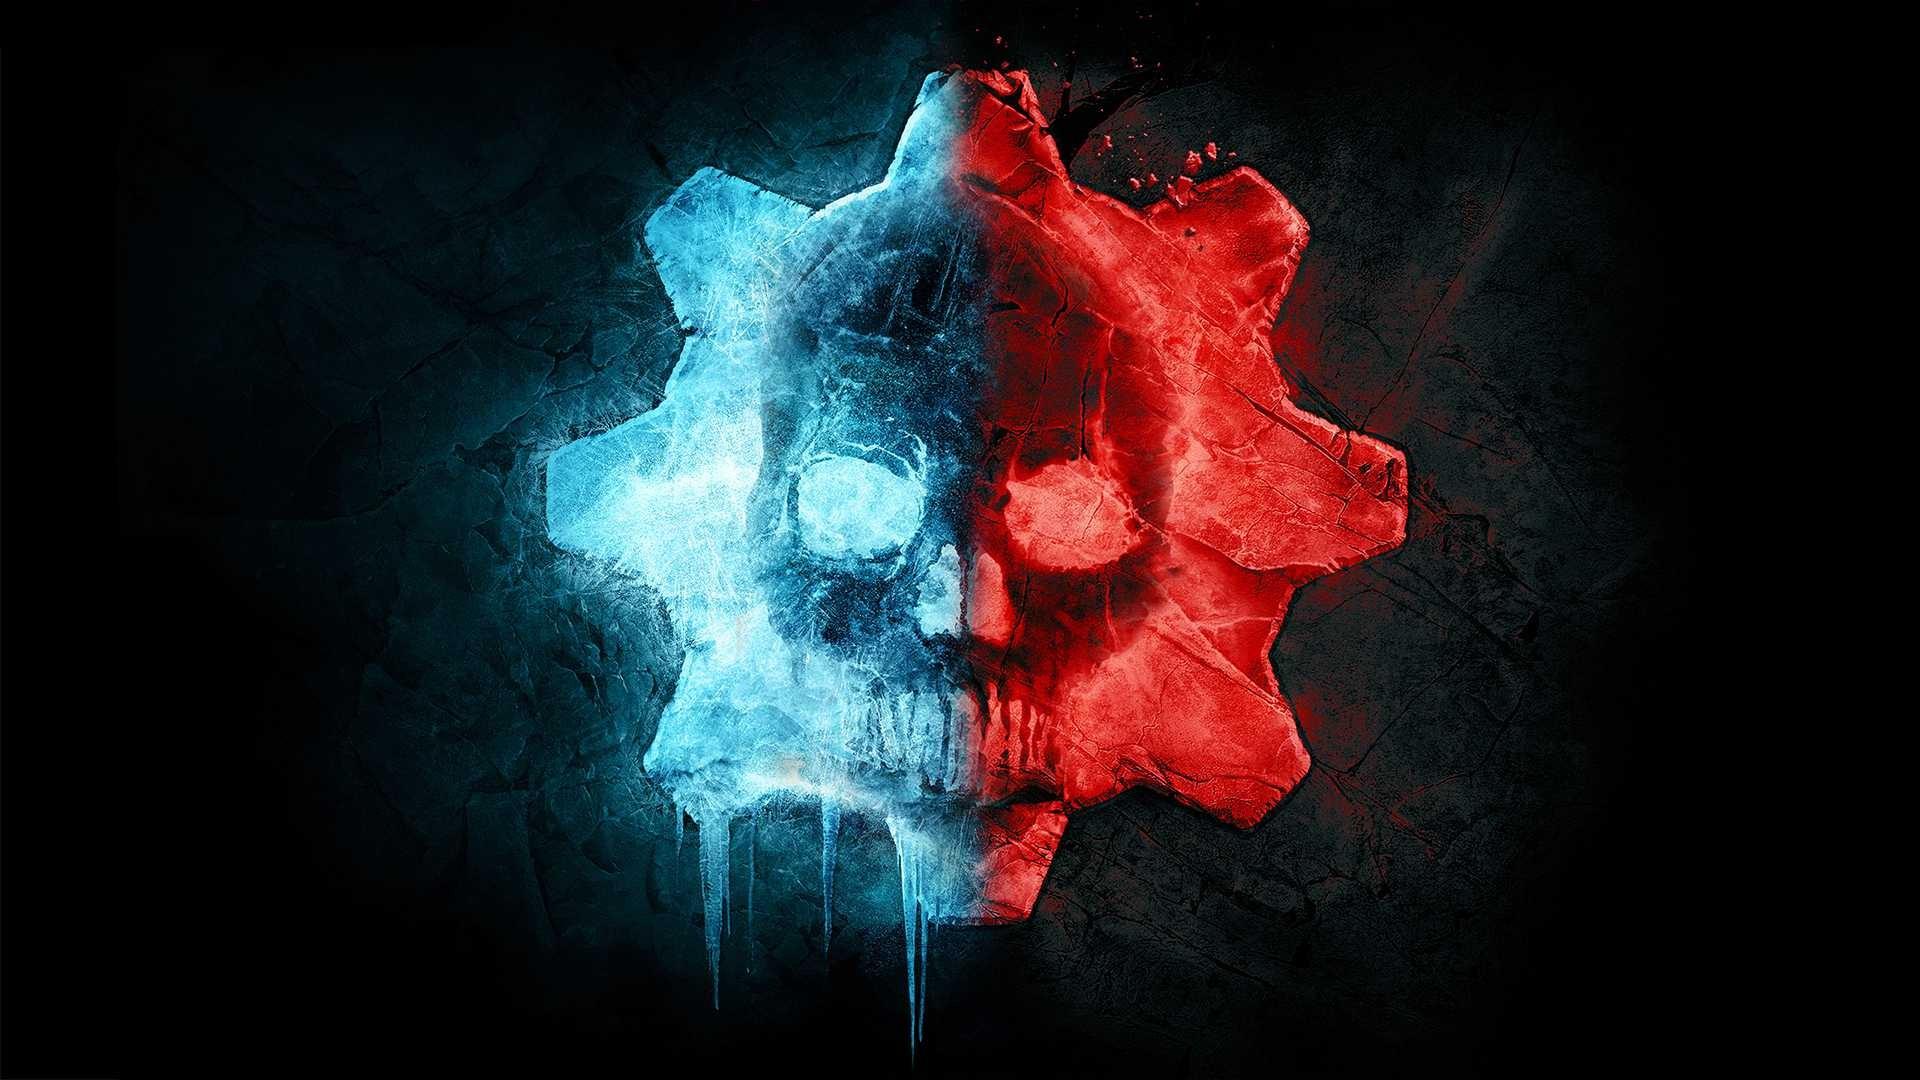 Gears 5 logo blu e rosso